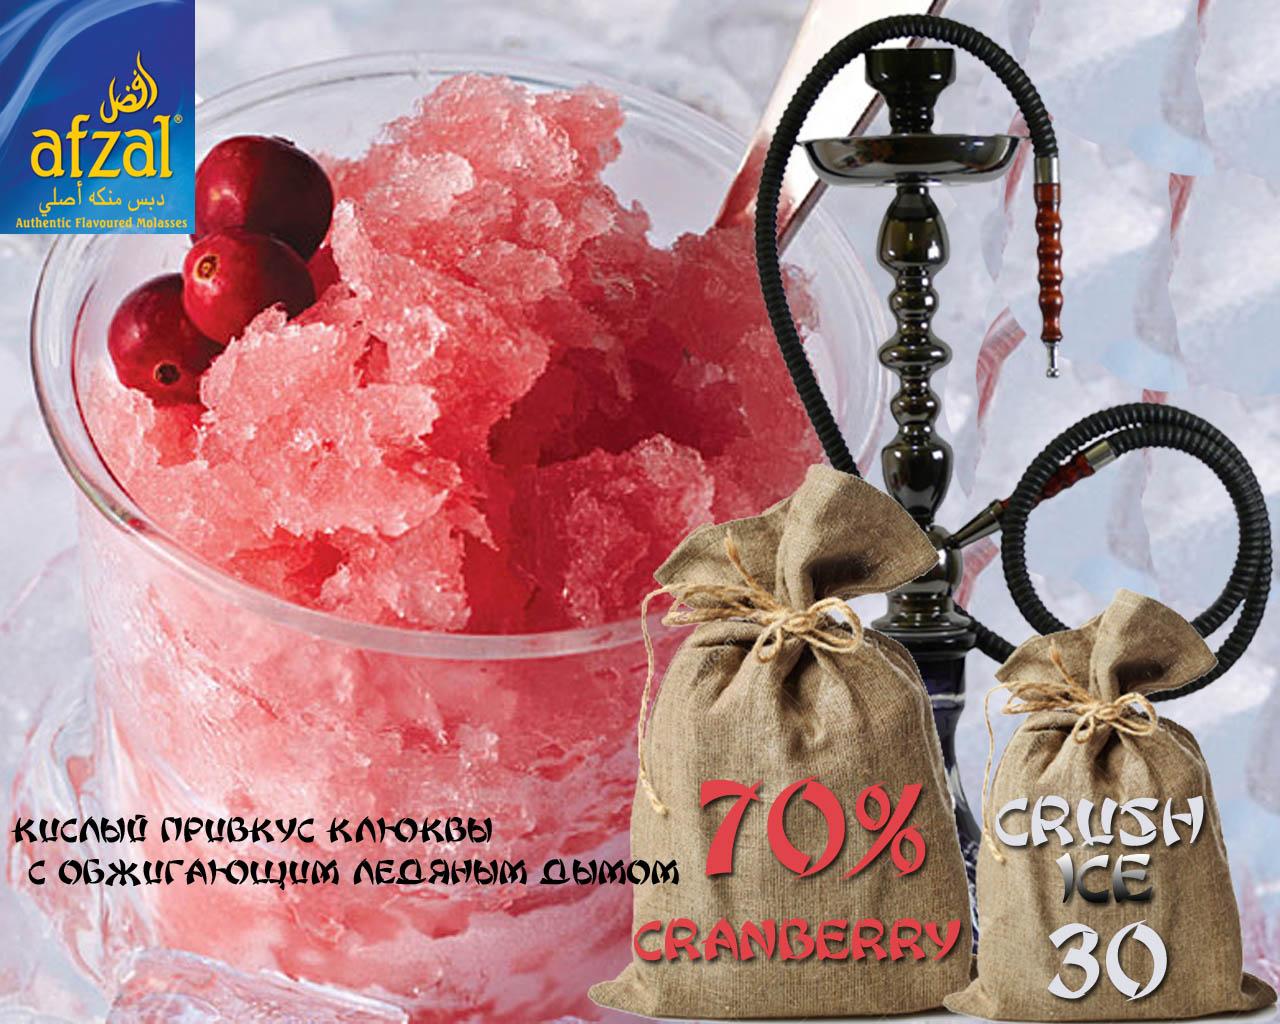 Afzal миксы cranberry ice